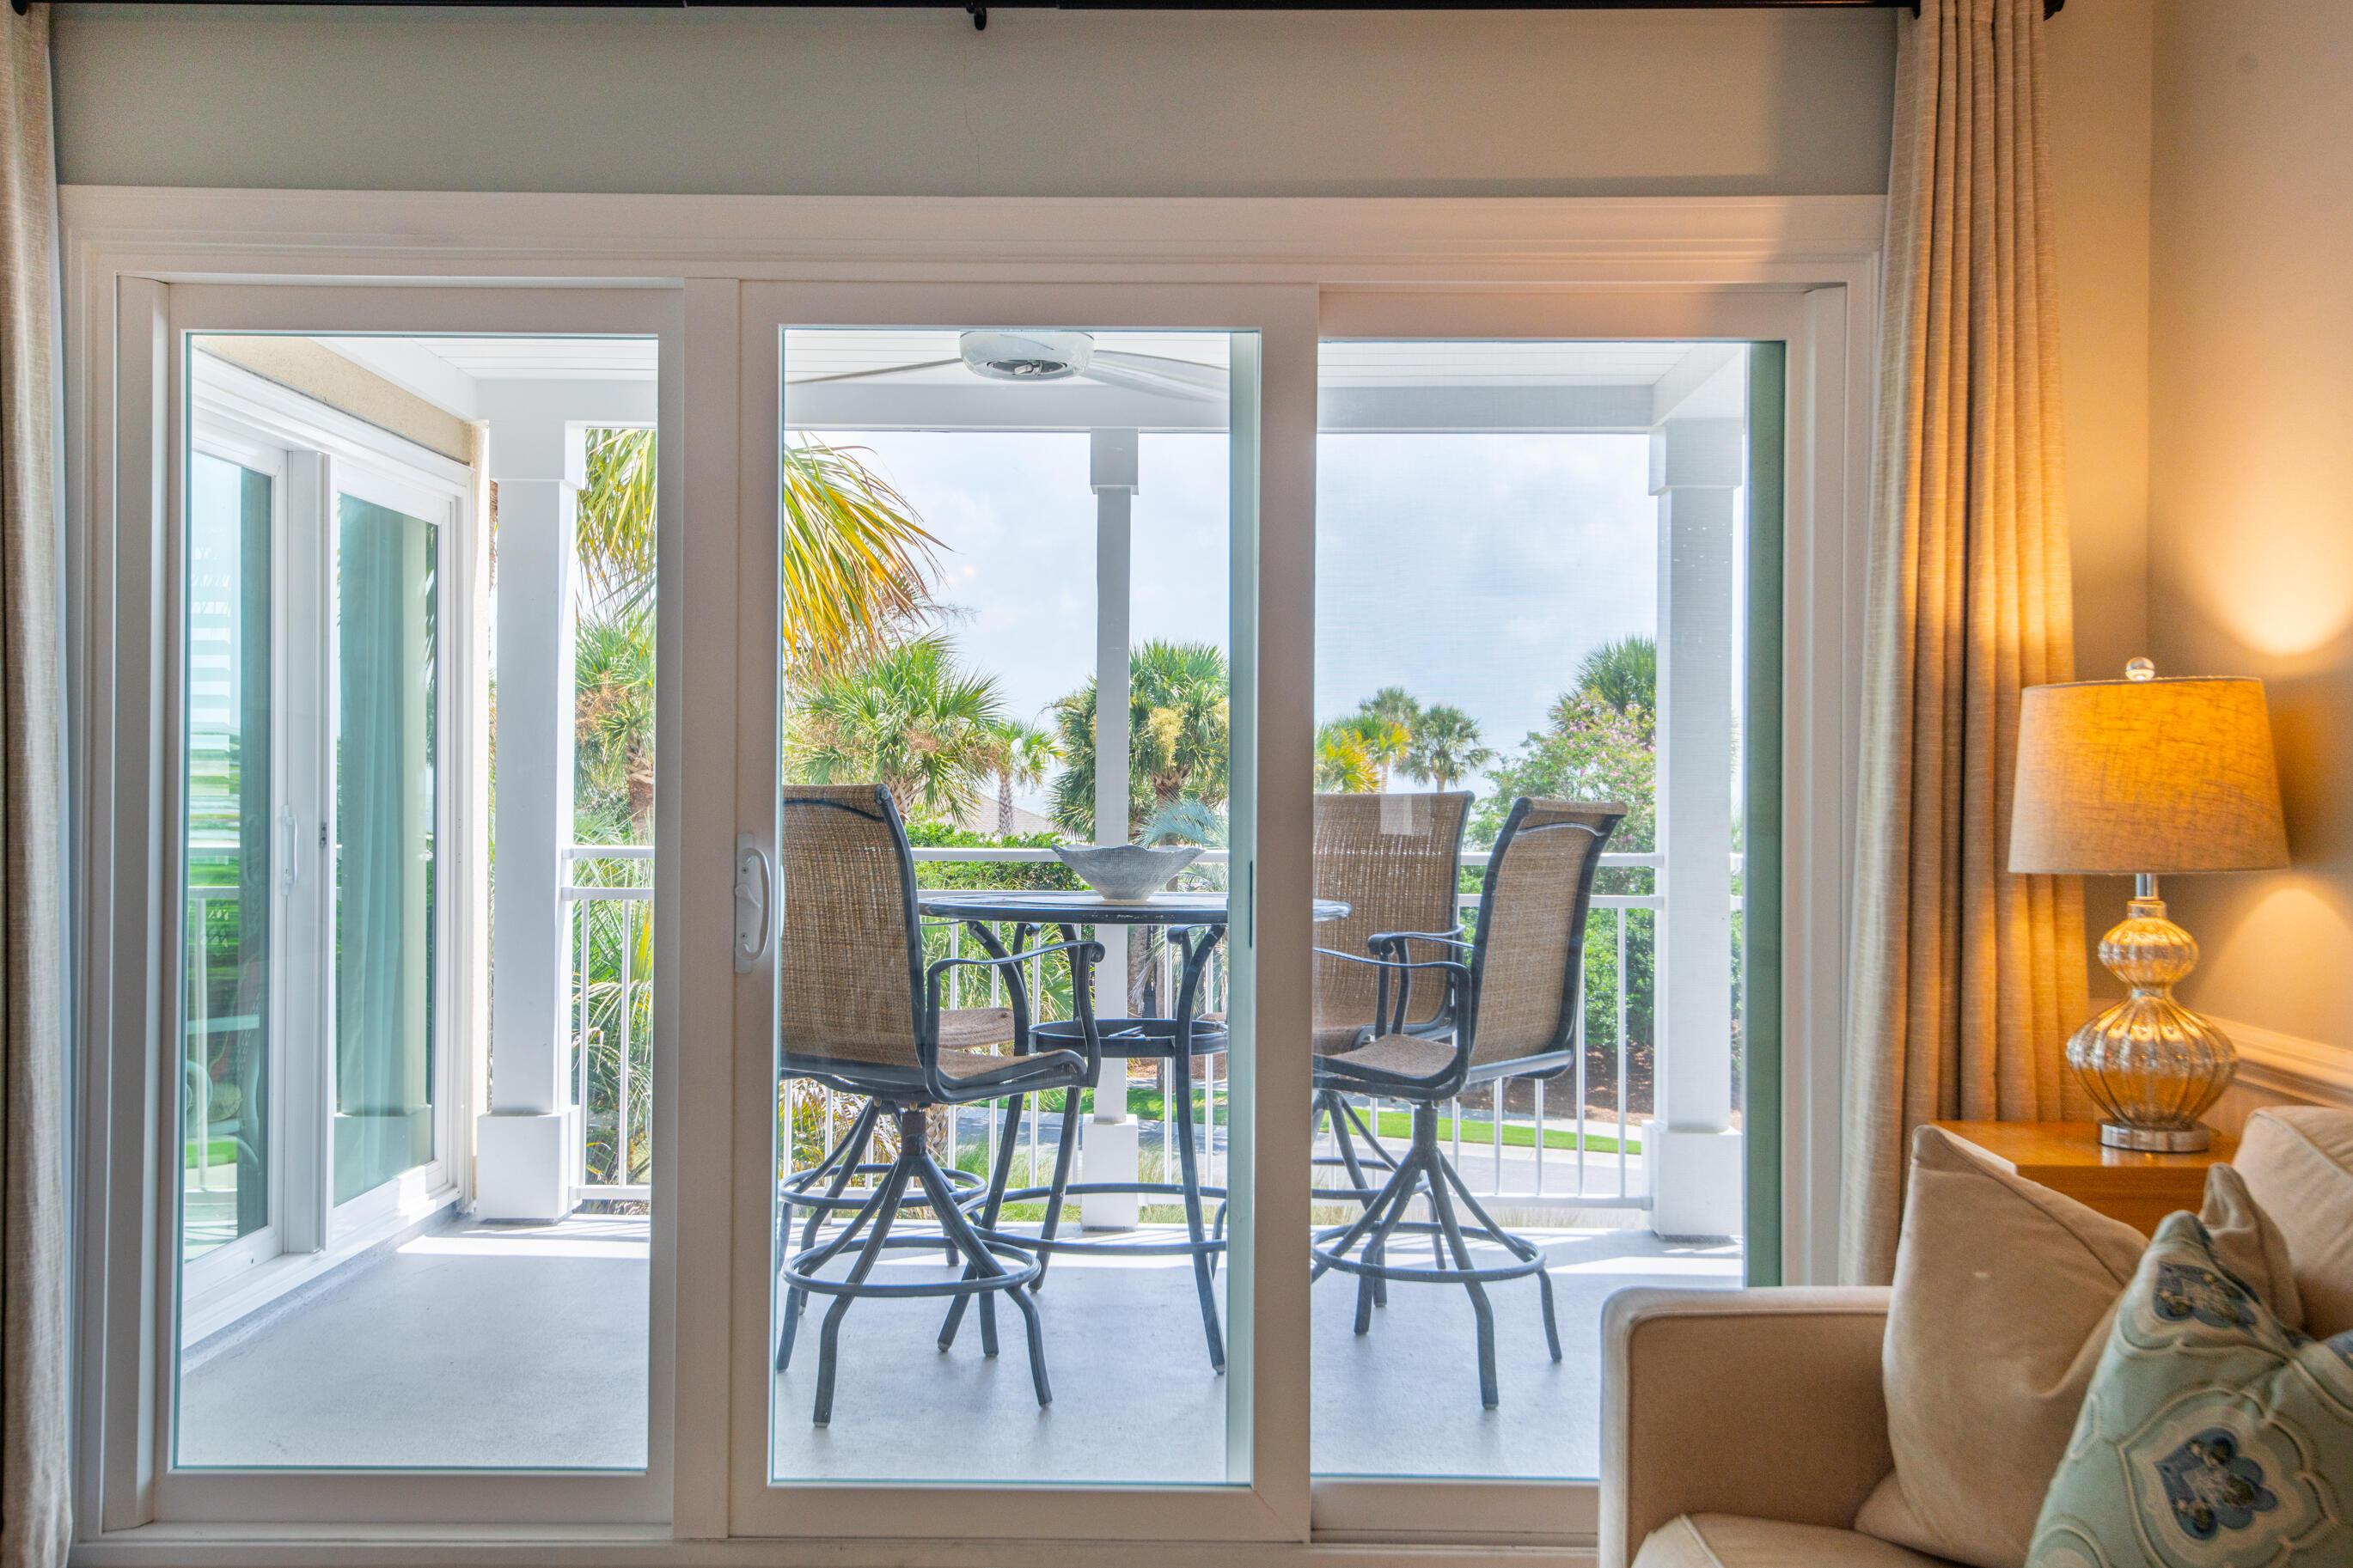 Atrium Villas Homes For Sale - 2935 Atrium Villa, Seabrook Island, SC - 32